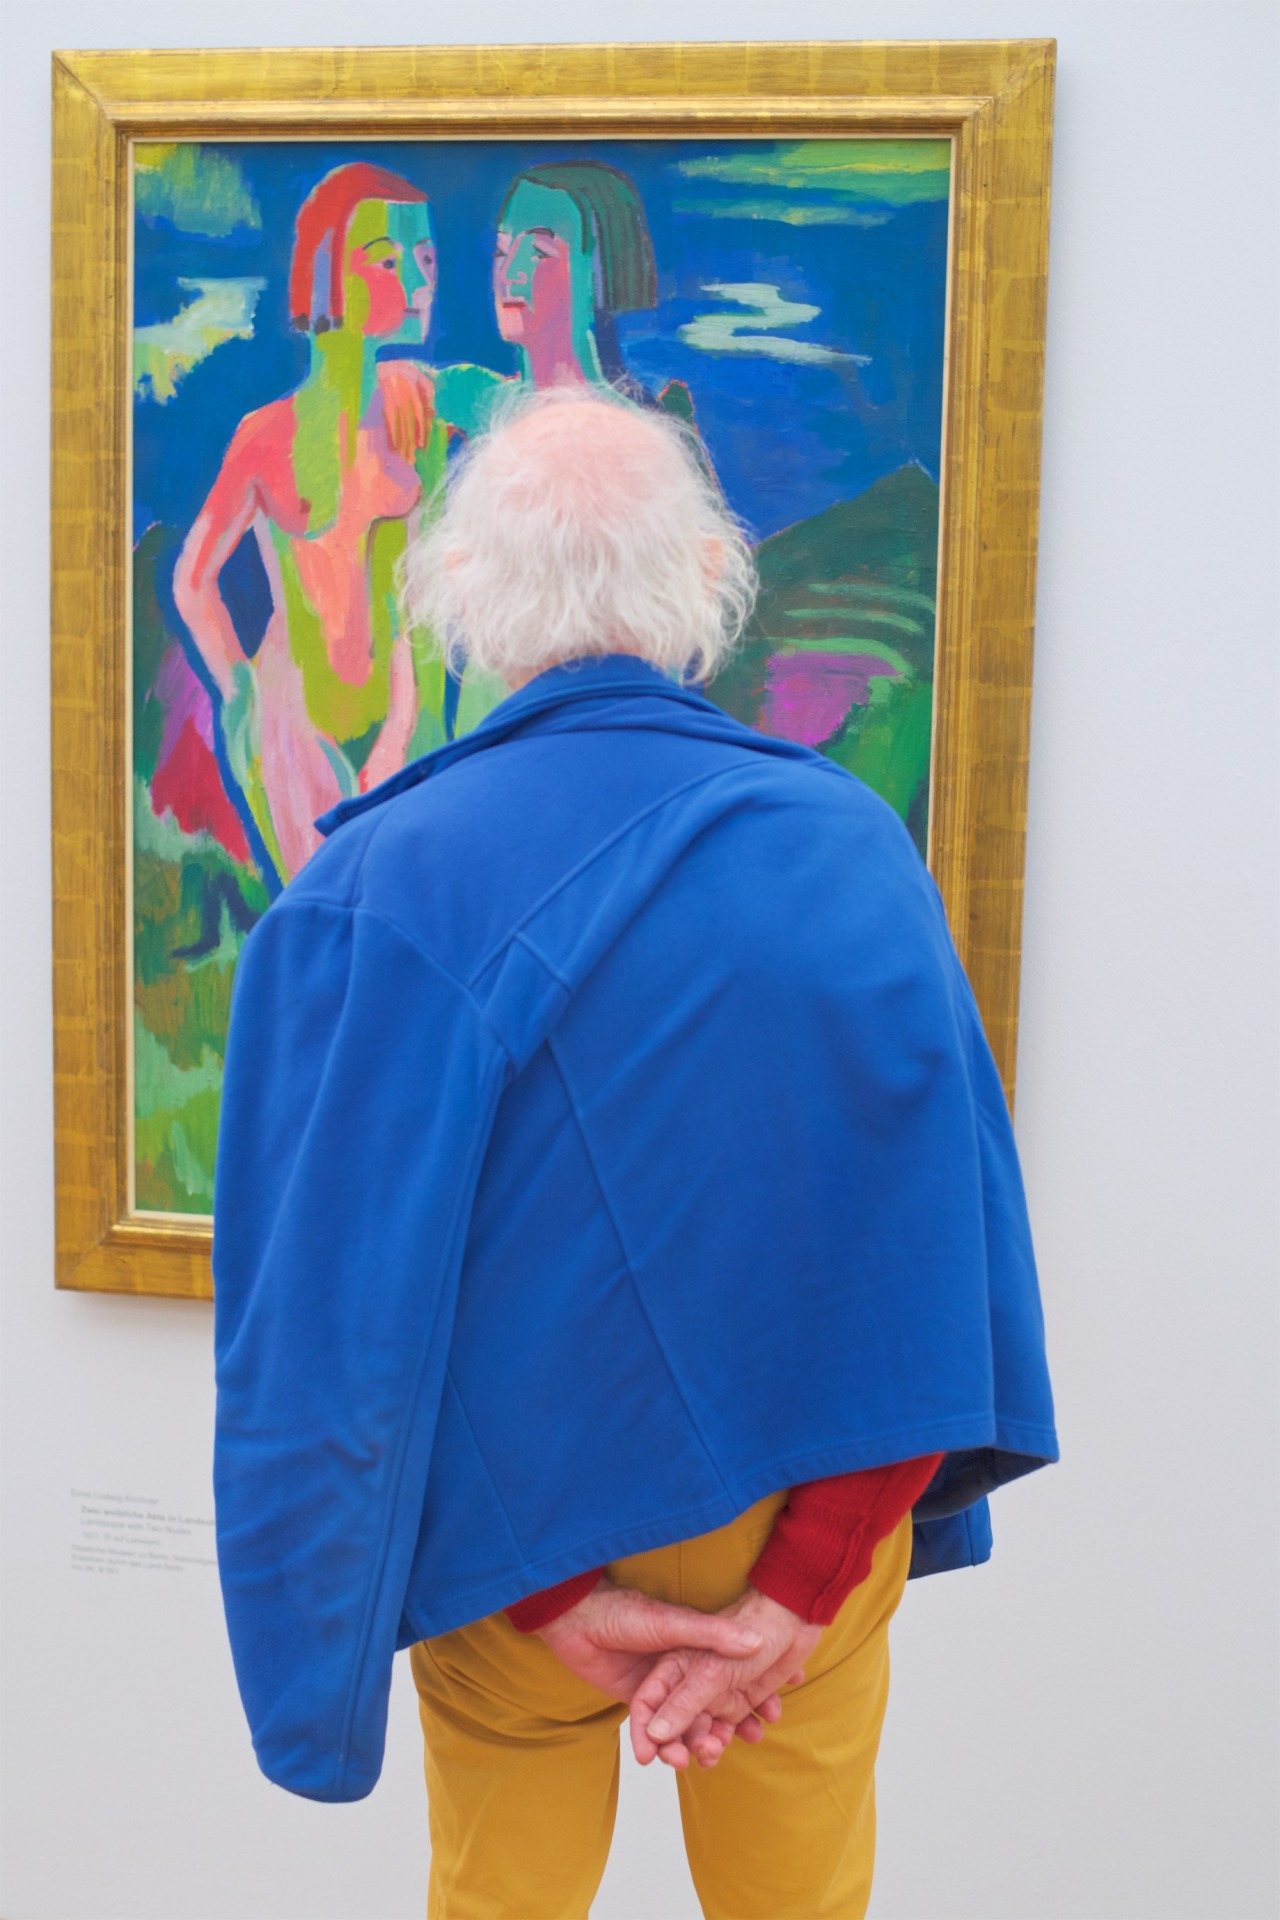 people-matching-artworks-14